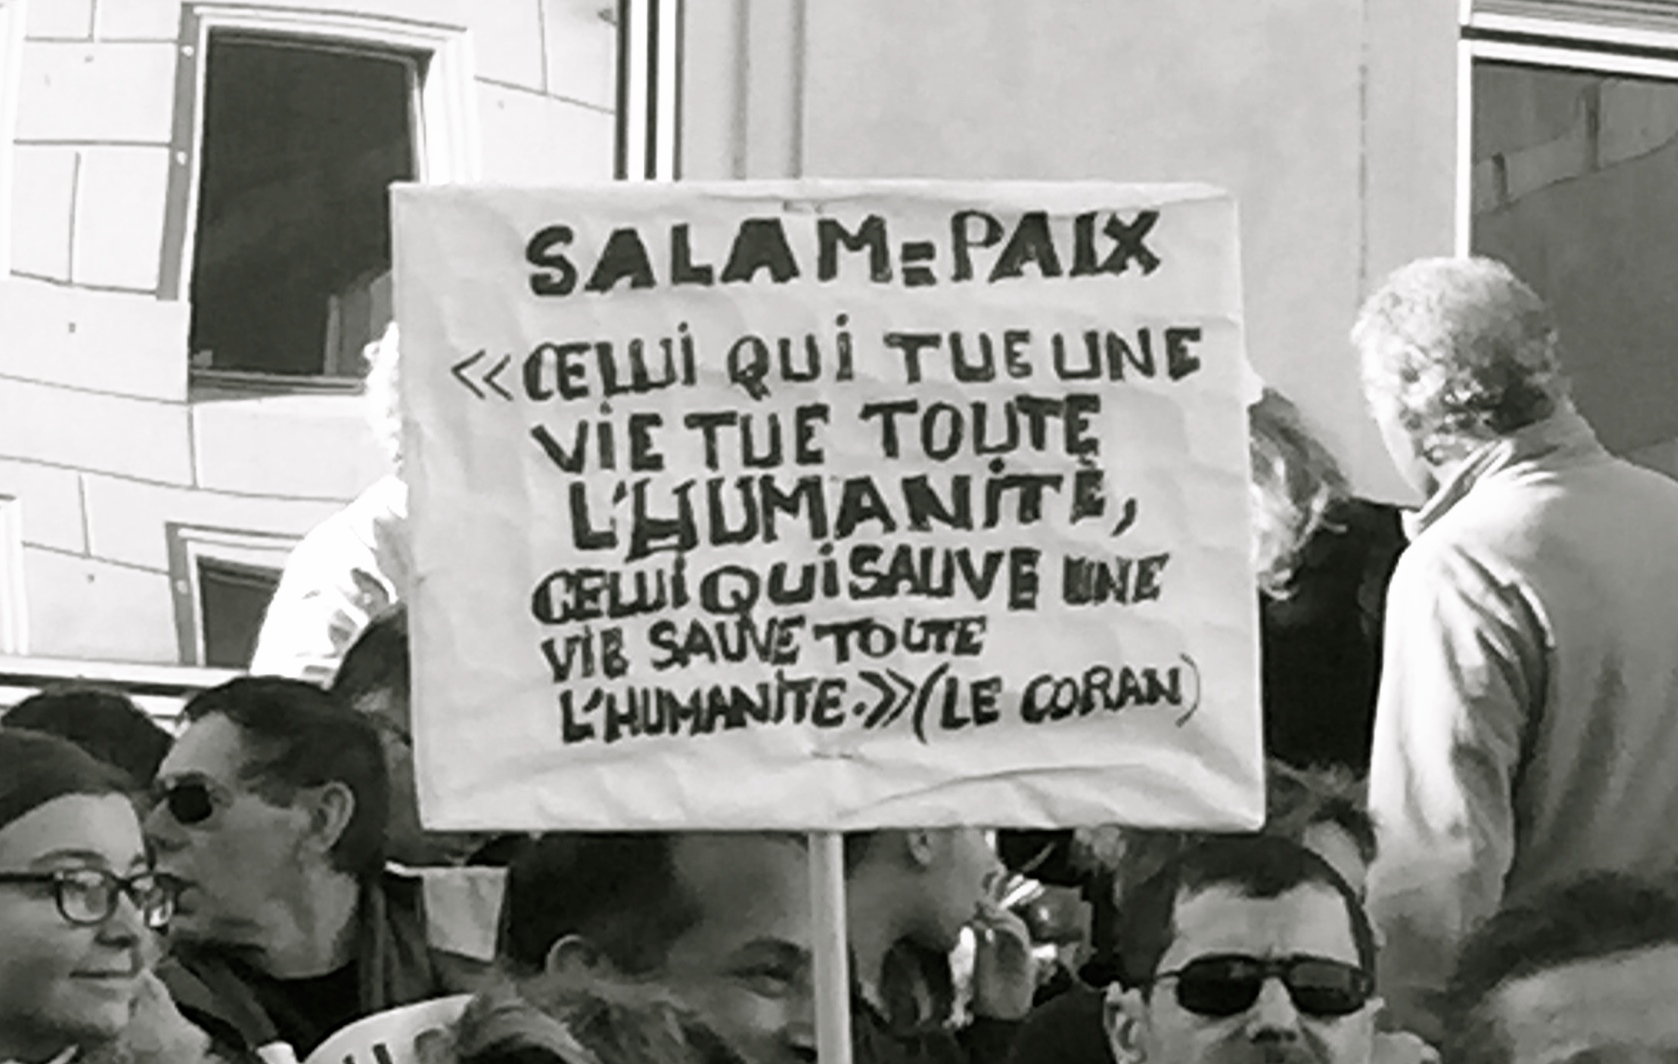 Salam = Paix